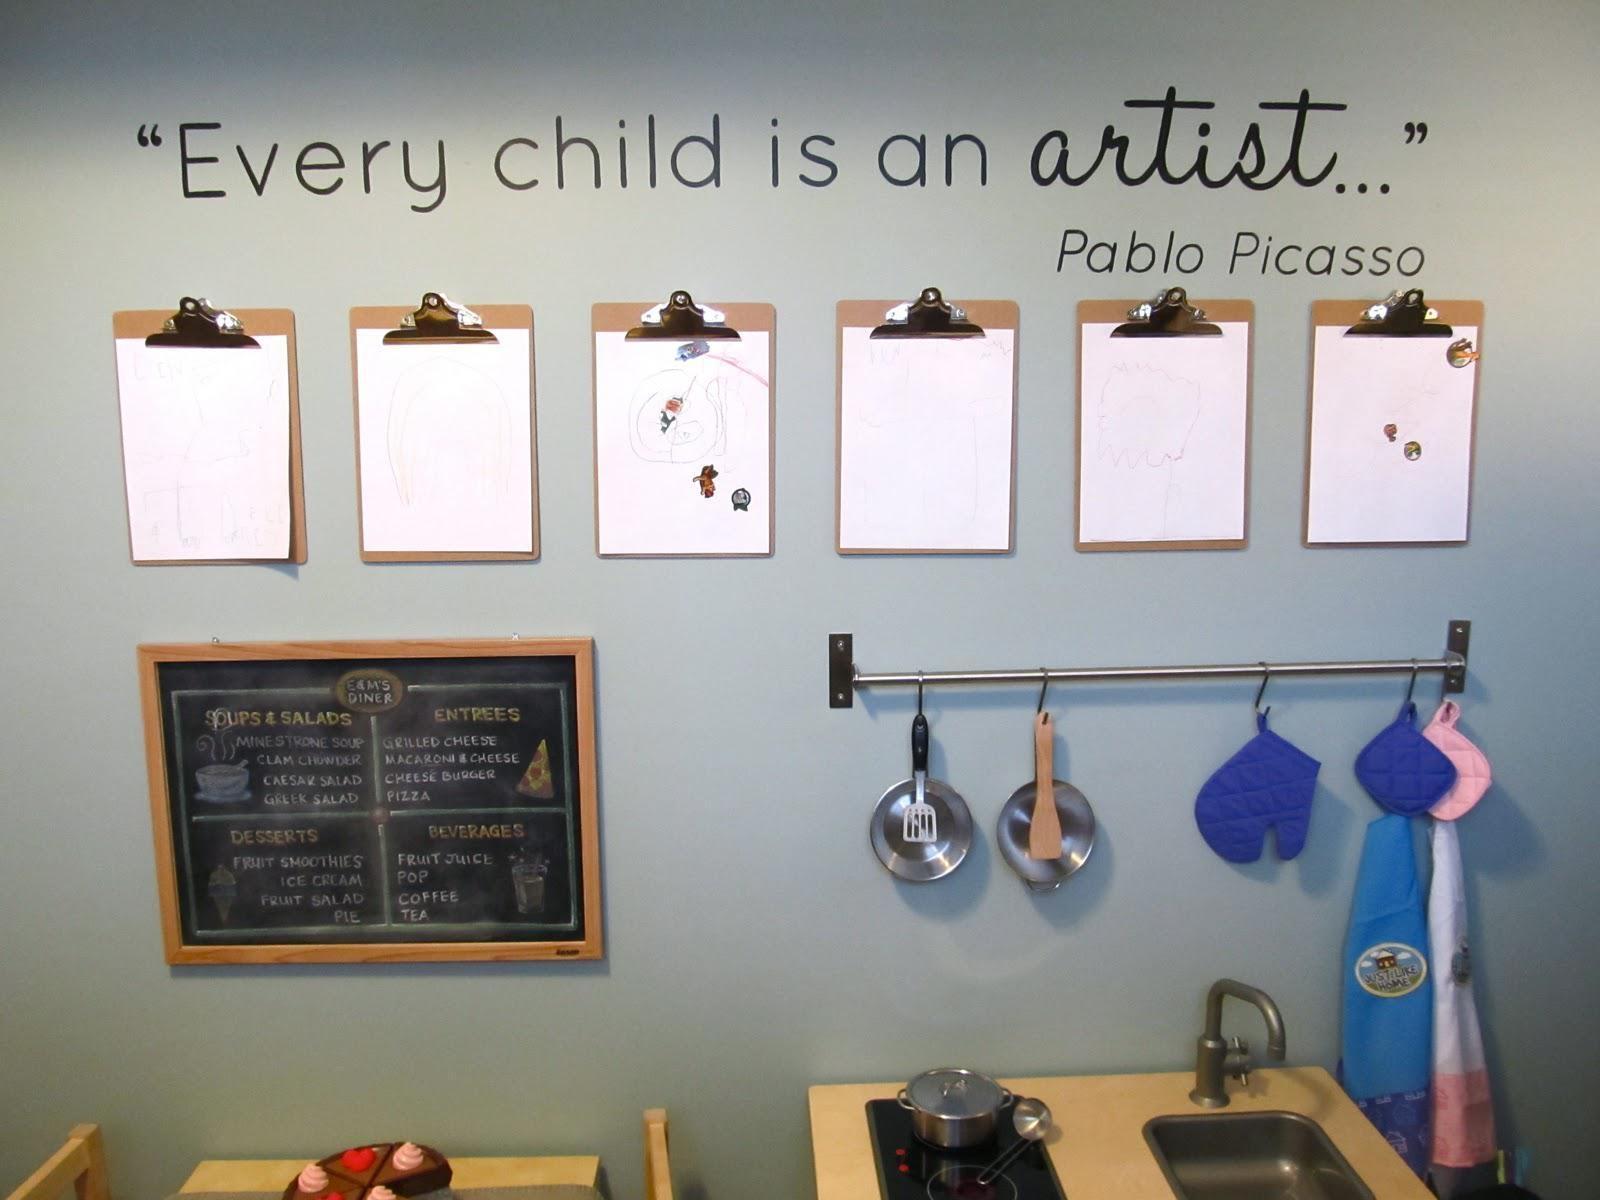 Wall Art Ideas: Wall Art for Playroom (Explore #10 of 20 Photos)